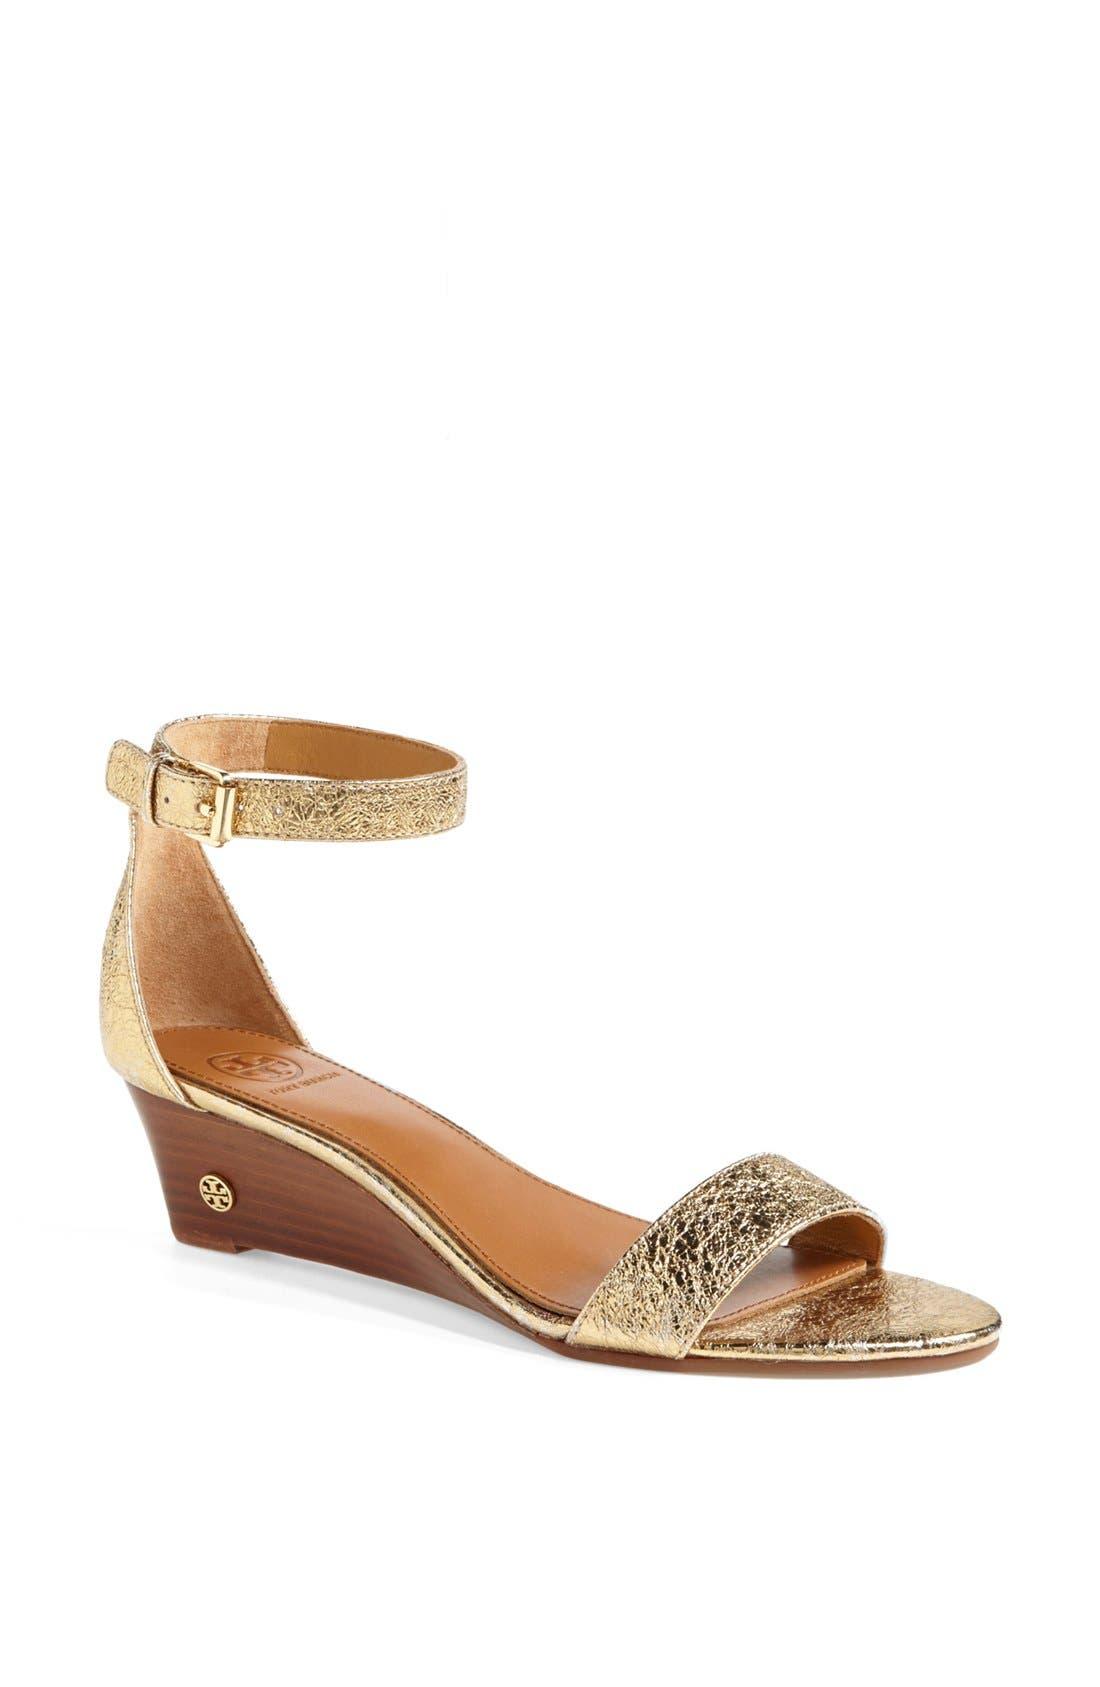 Main Image - Tory Burch 'Savannah' Wedge Sandal